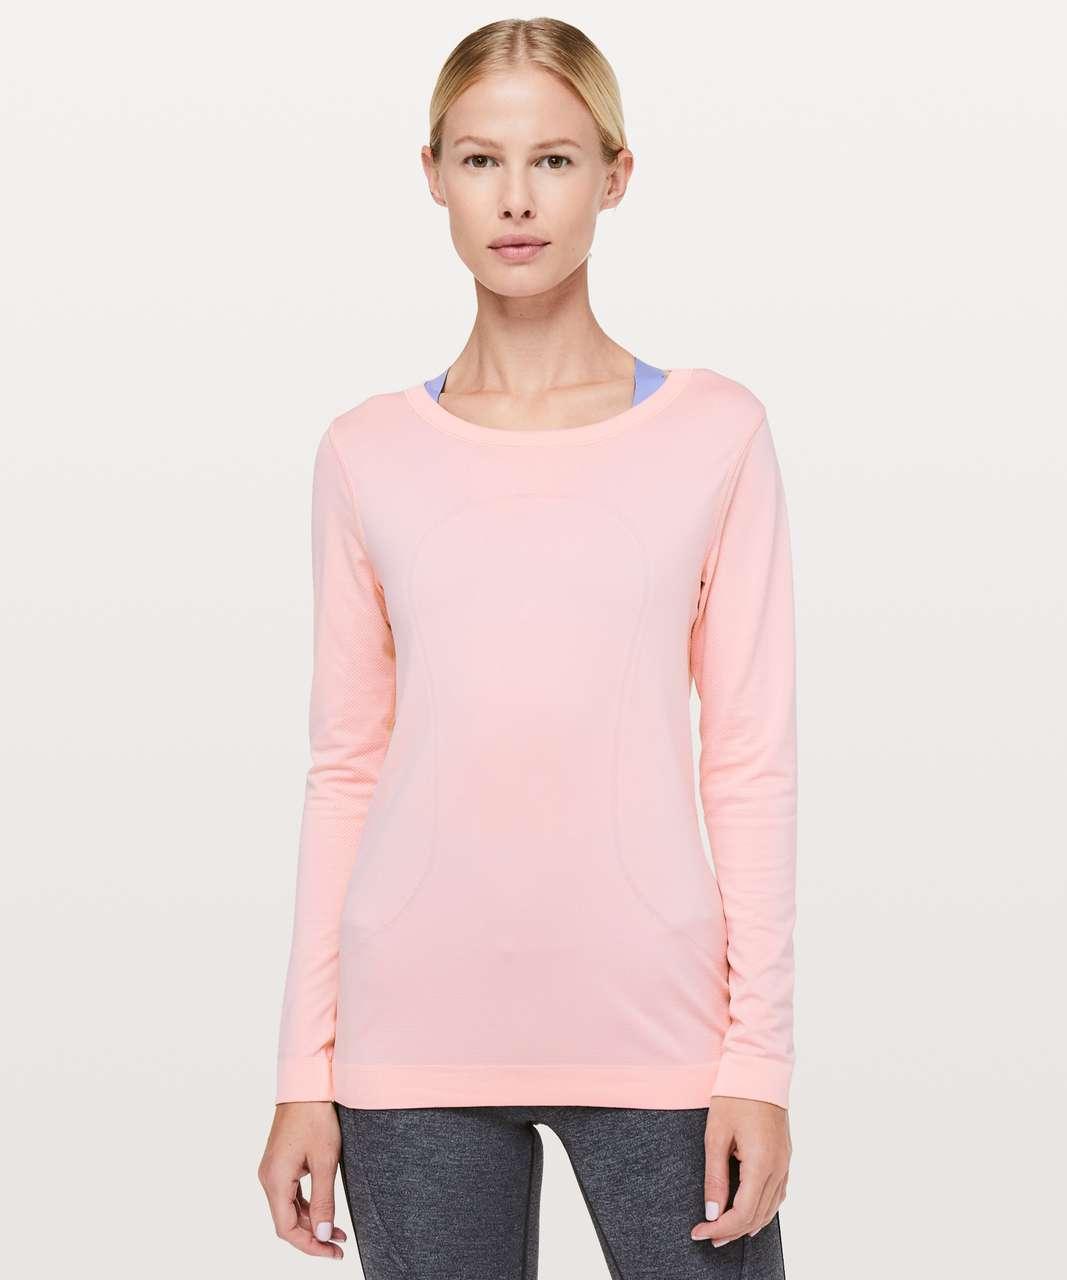 Lululemon Swiftly Tech Long Sleeve (Breeze) *Relaxed Fit - Dusty Pink / Dusty Pink